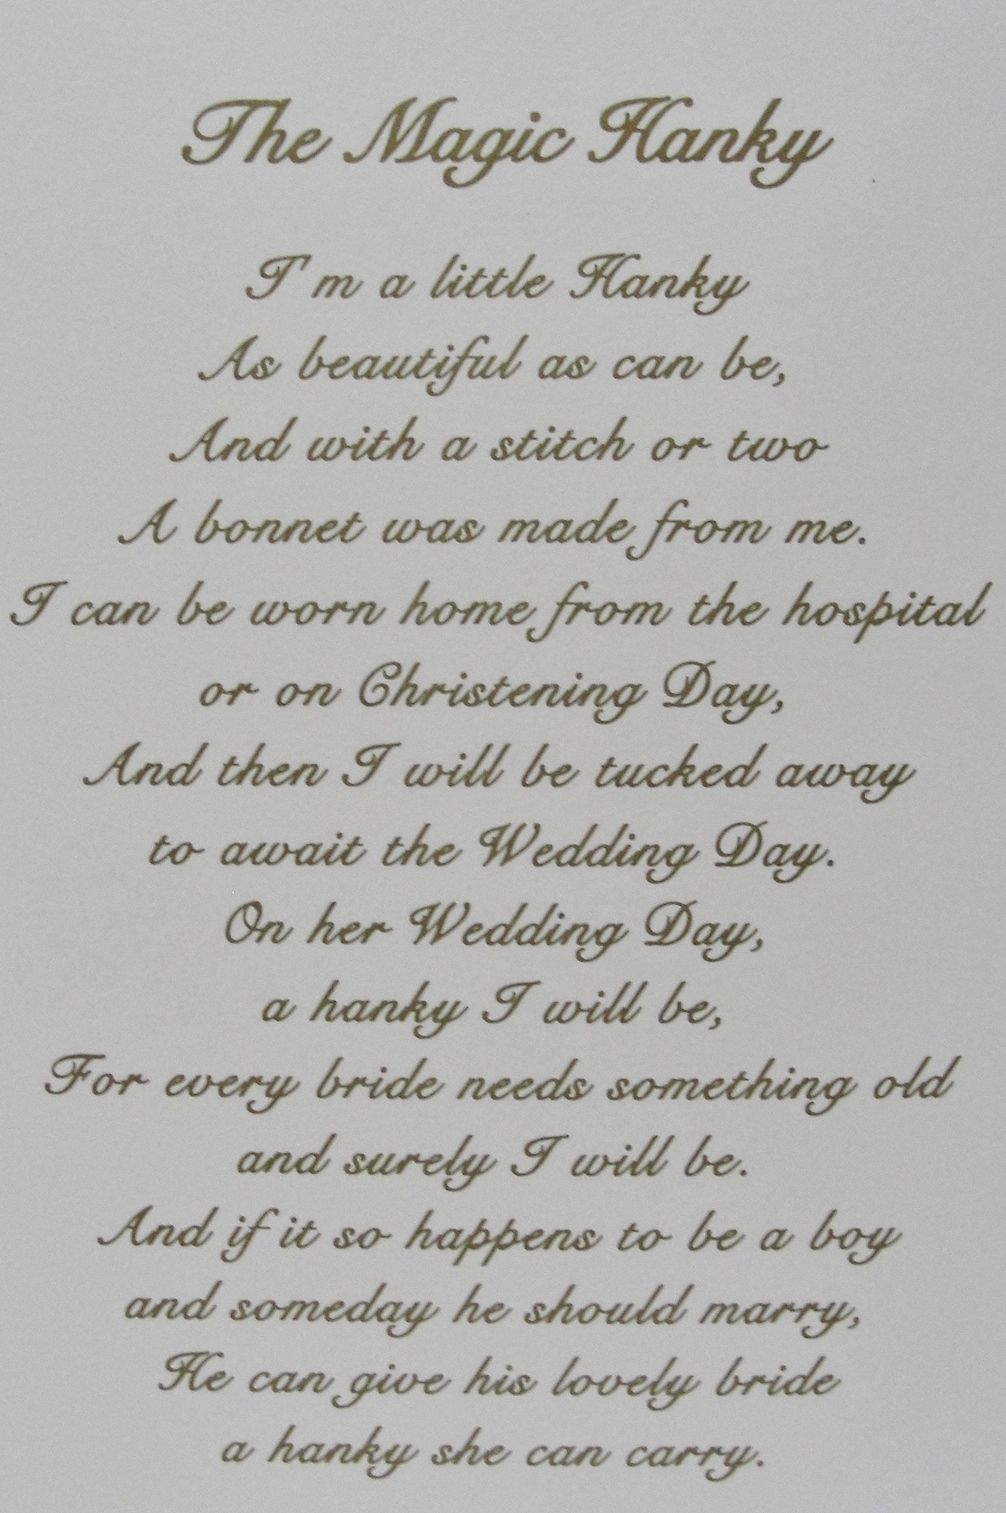 Irish Poem For New Home